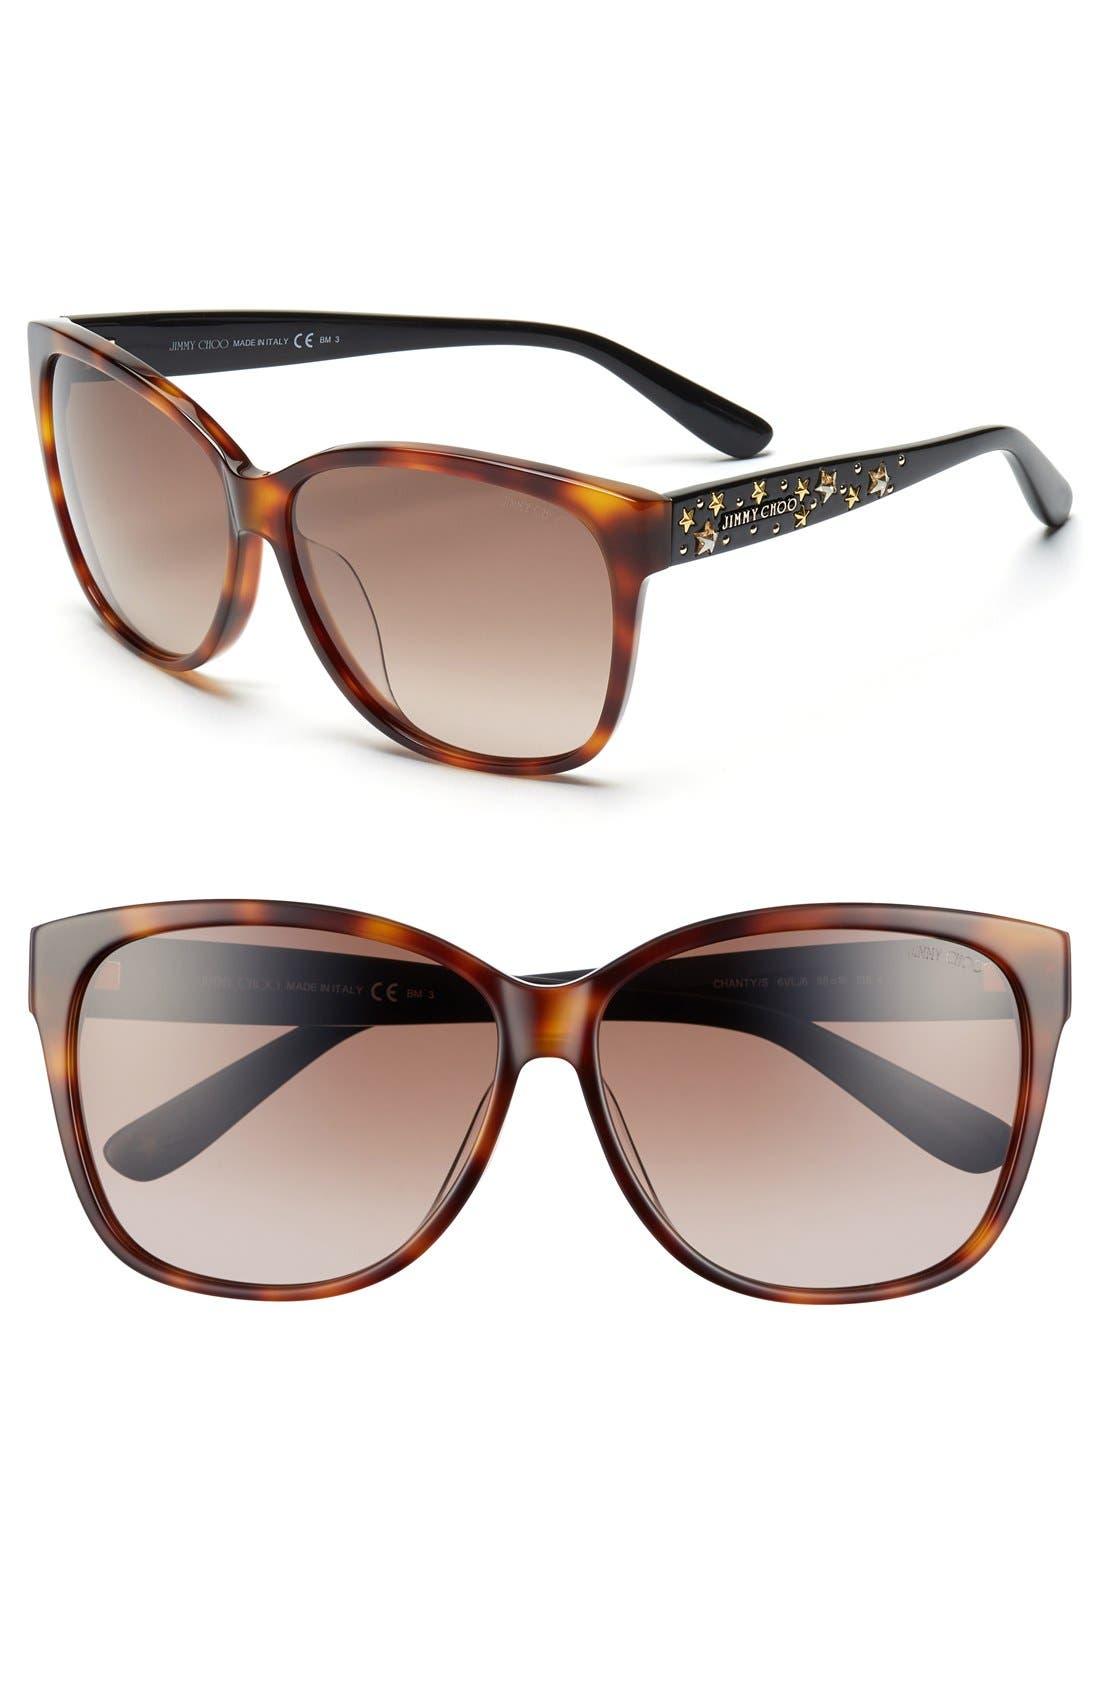 Alternate Image 1 Selected - Jimmy Choo 'Chantys' 58mm Sunglasses